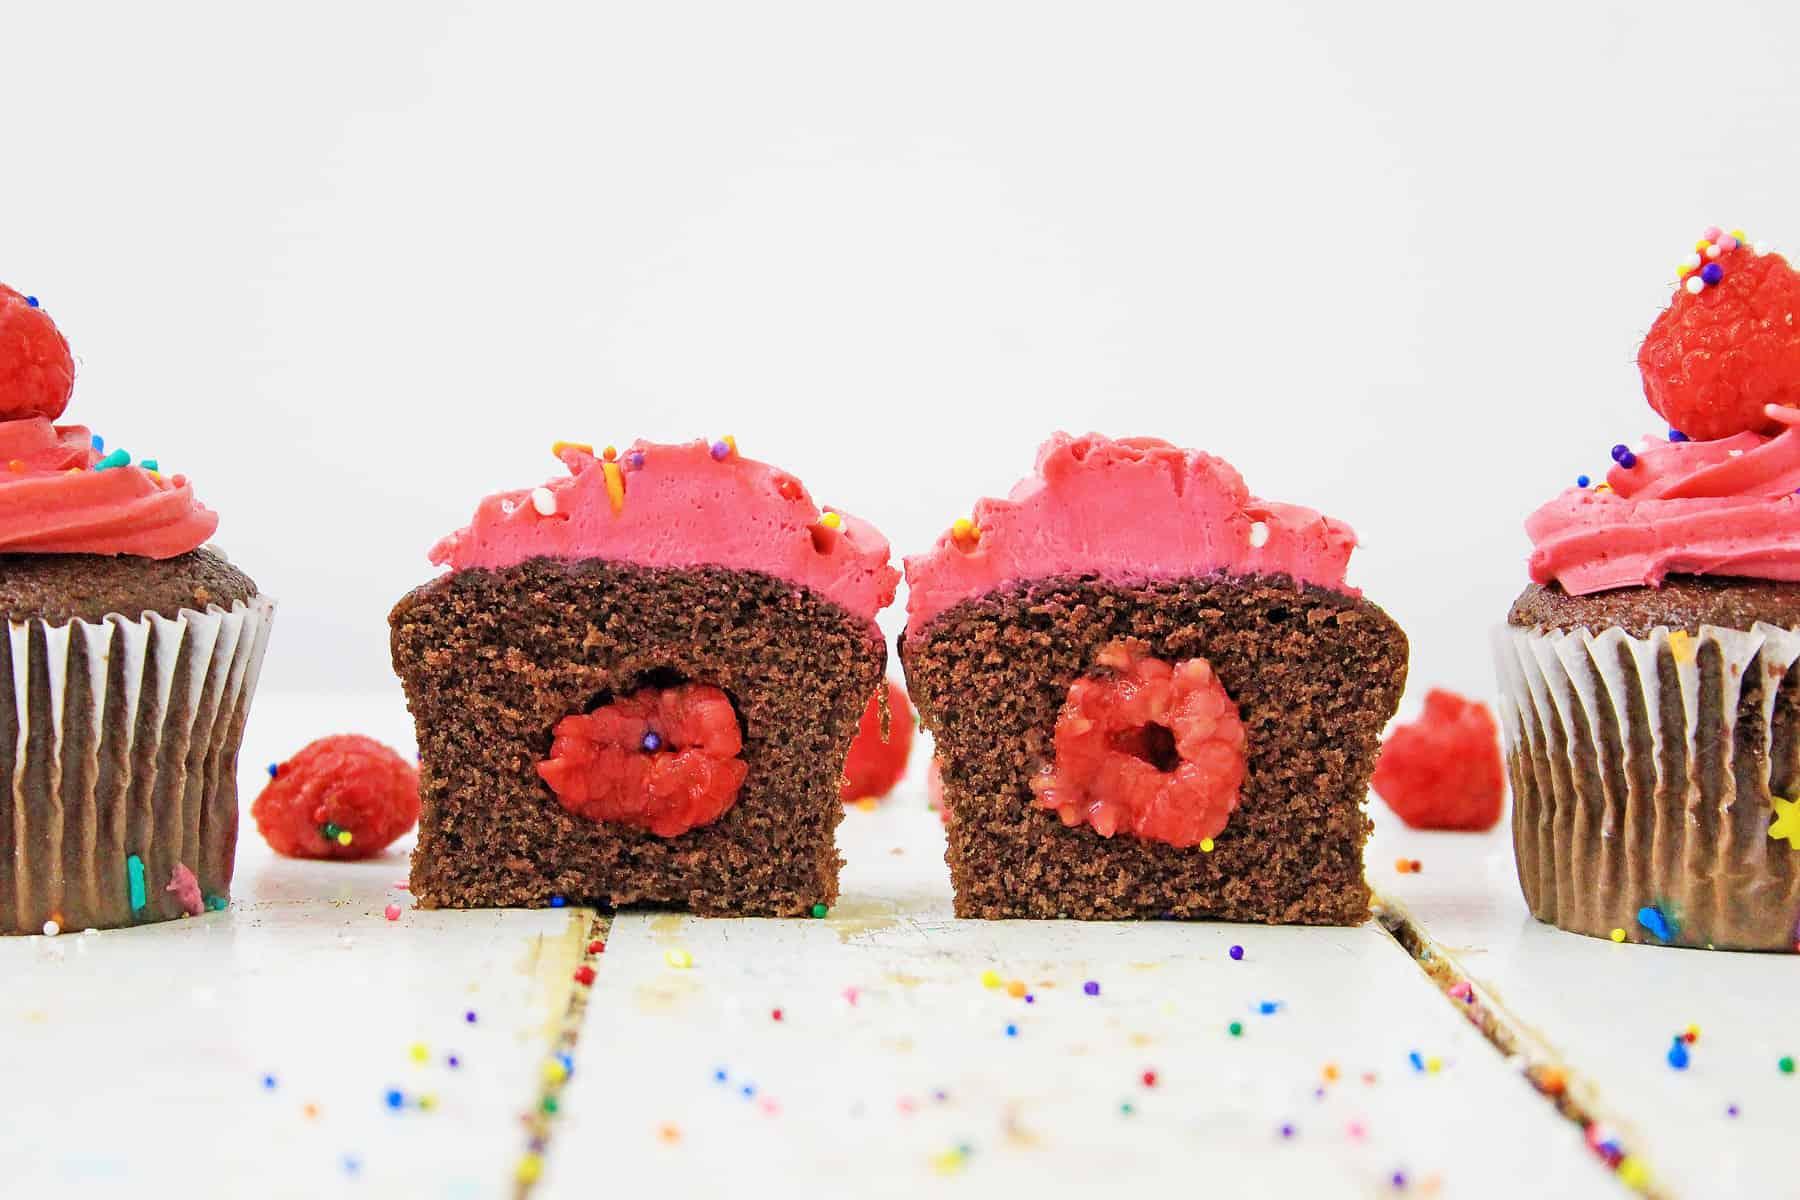 Center of raspberry cupcake